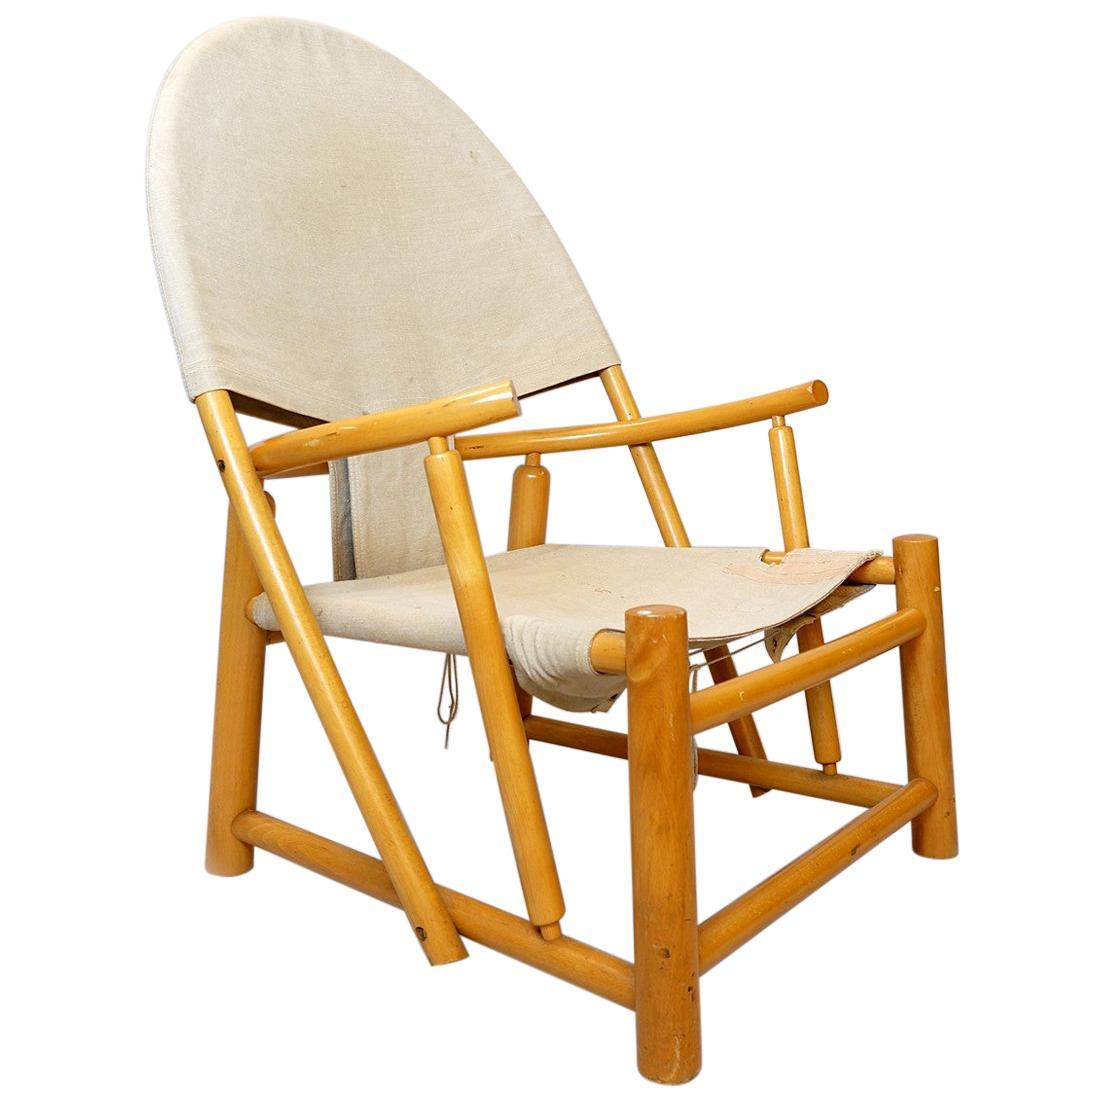 Mid-Century Modern G23 Hoop Armchair by Piero Palange & Werther Toffoloni, Germa